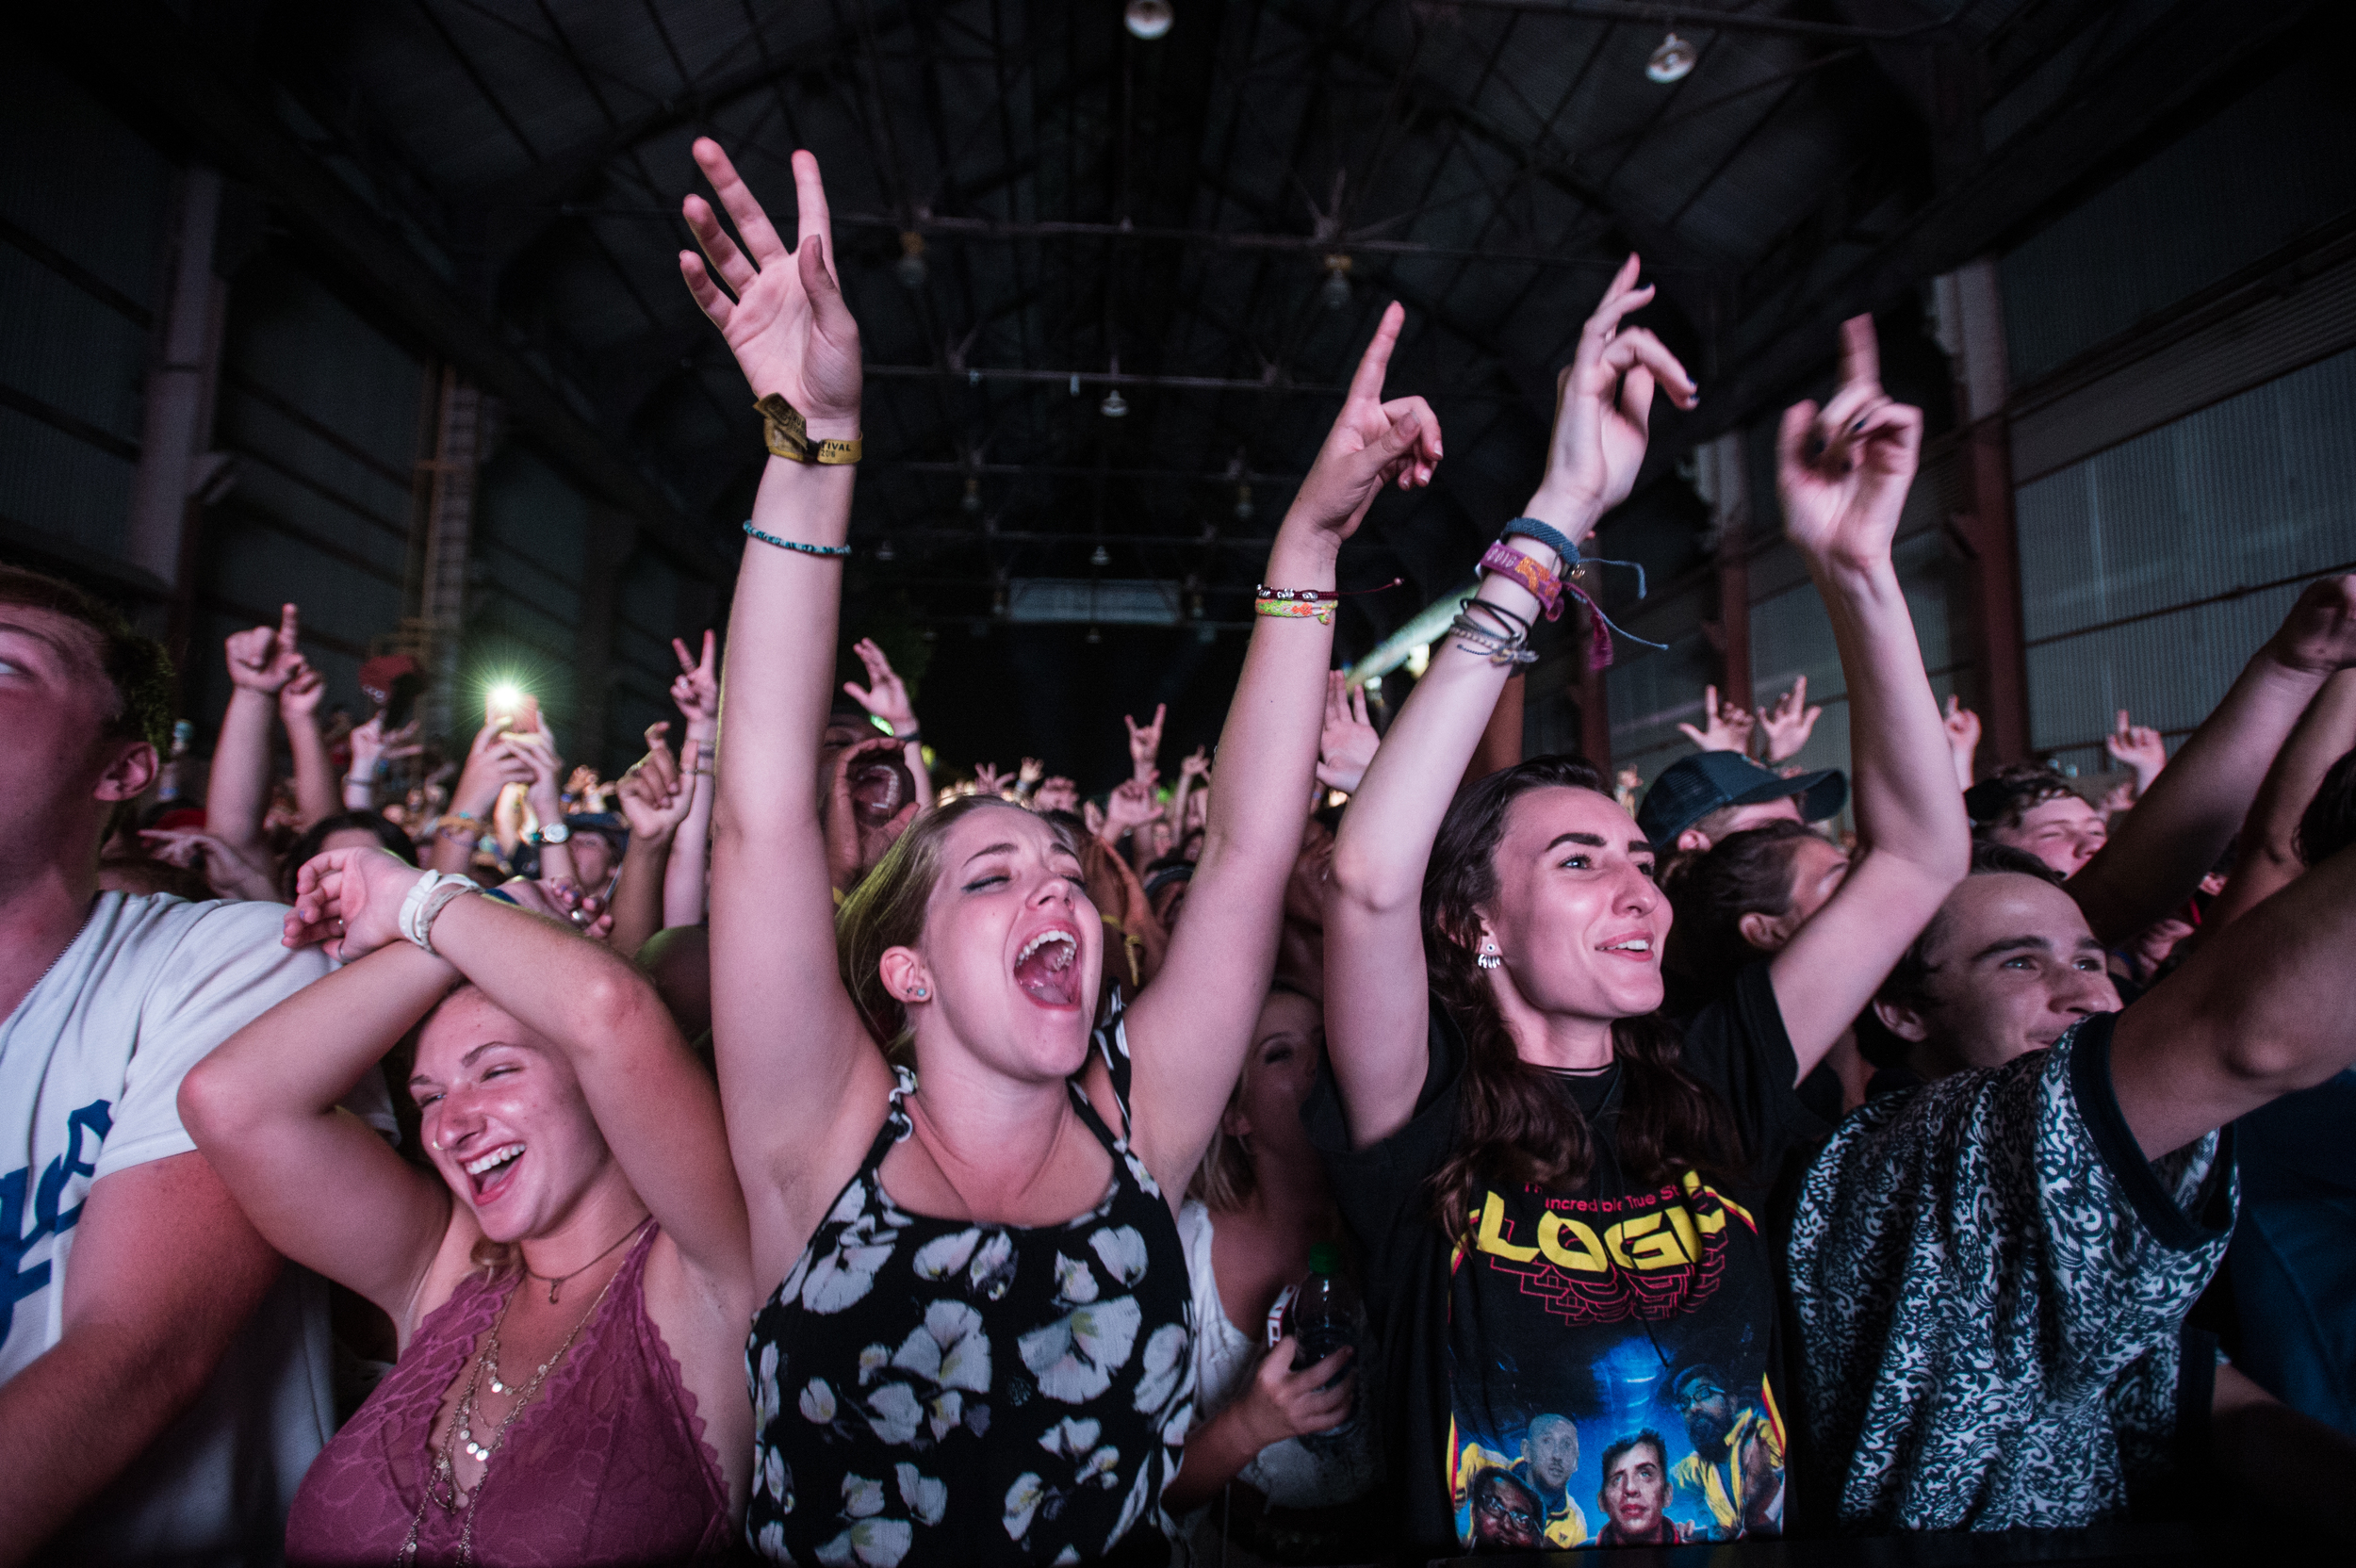 Fans Enjoying the Moment